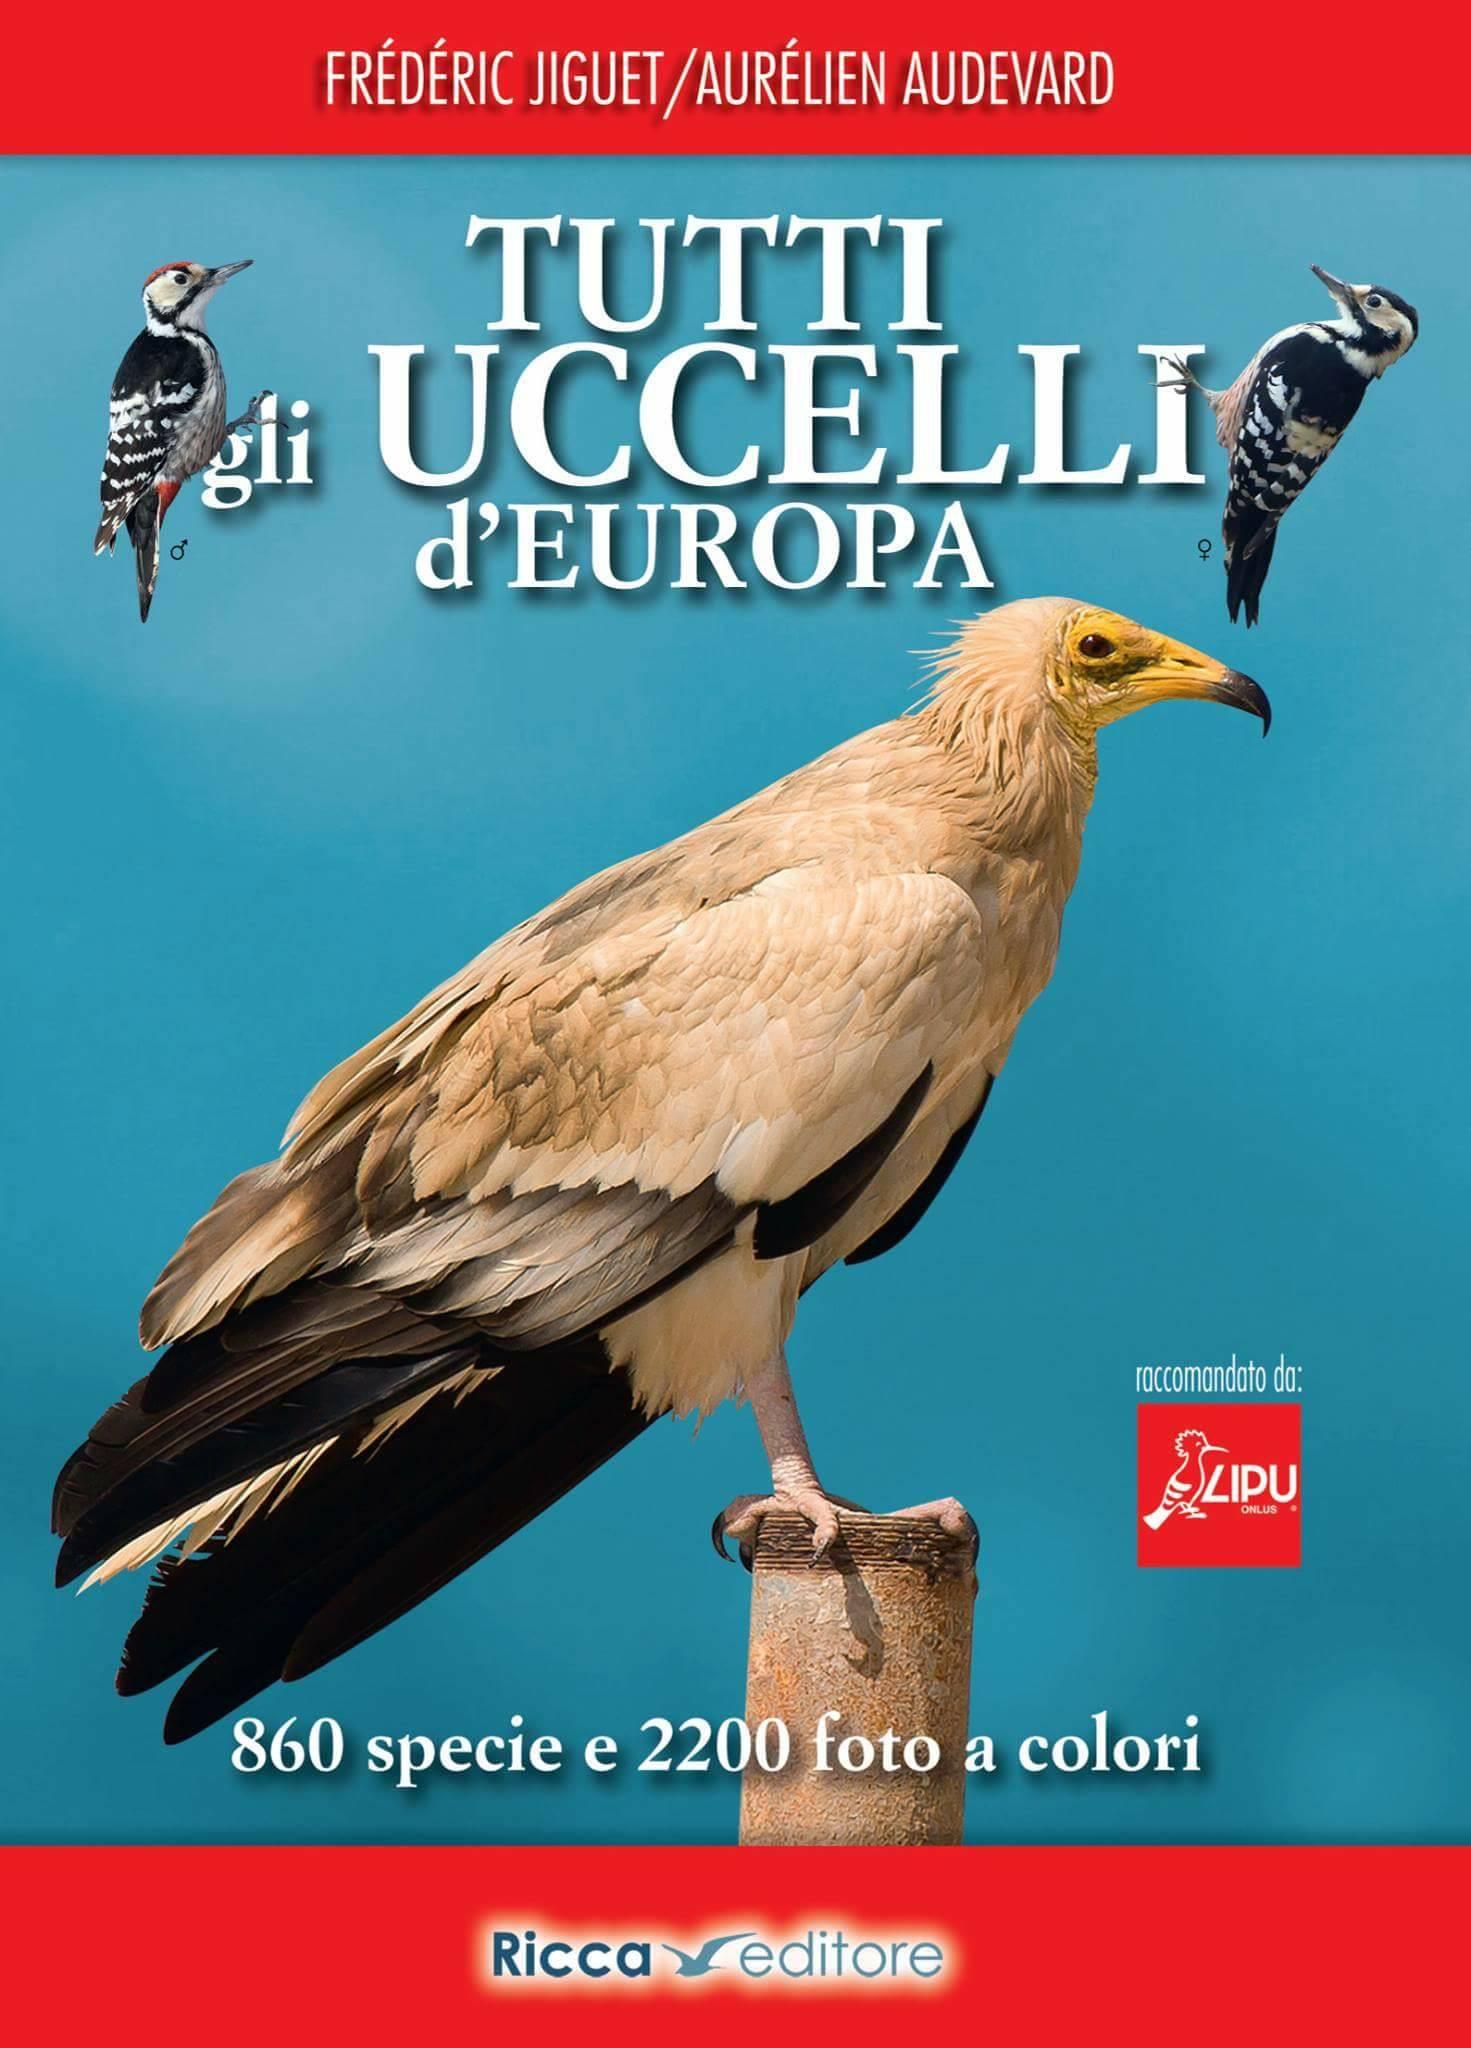 Tutti gli uccelli d'Europa. Frédéric Jiguet / Aurélien Audevard. Ricca Editore